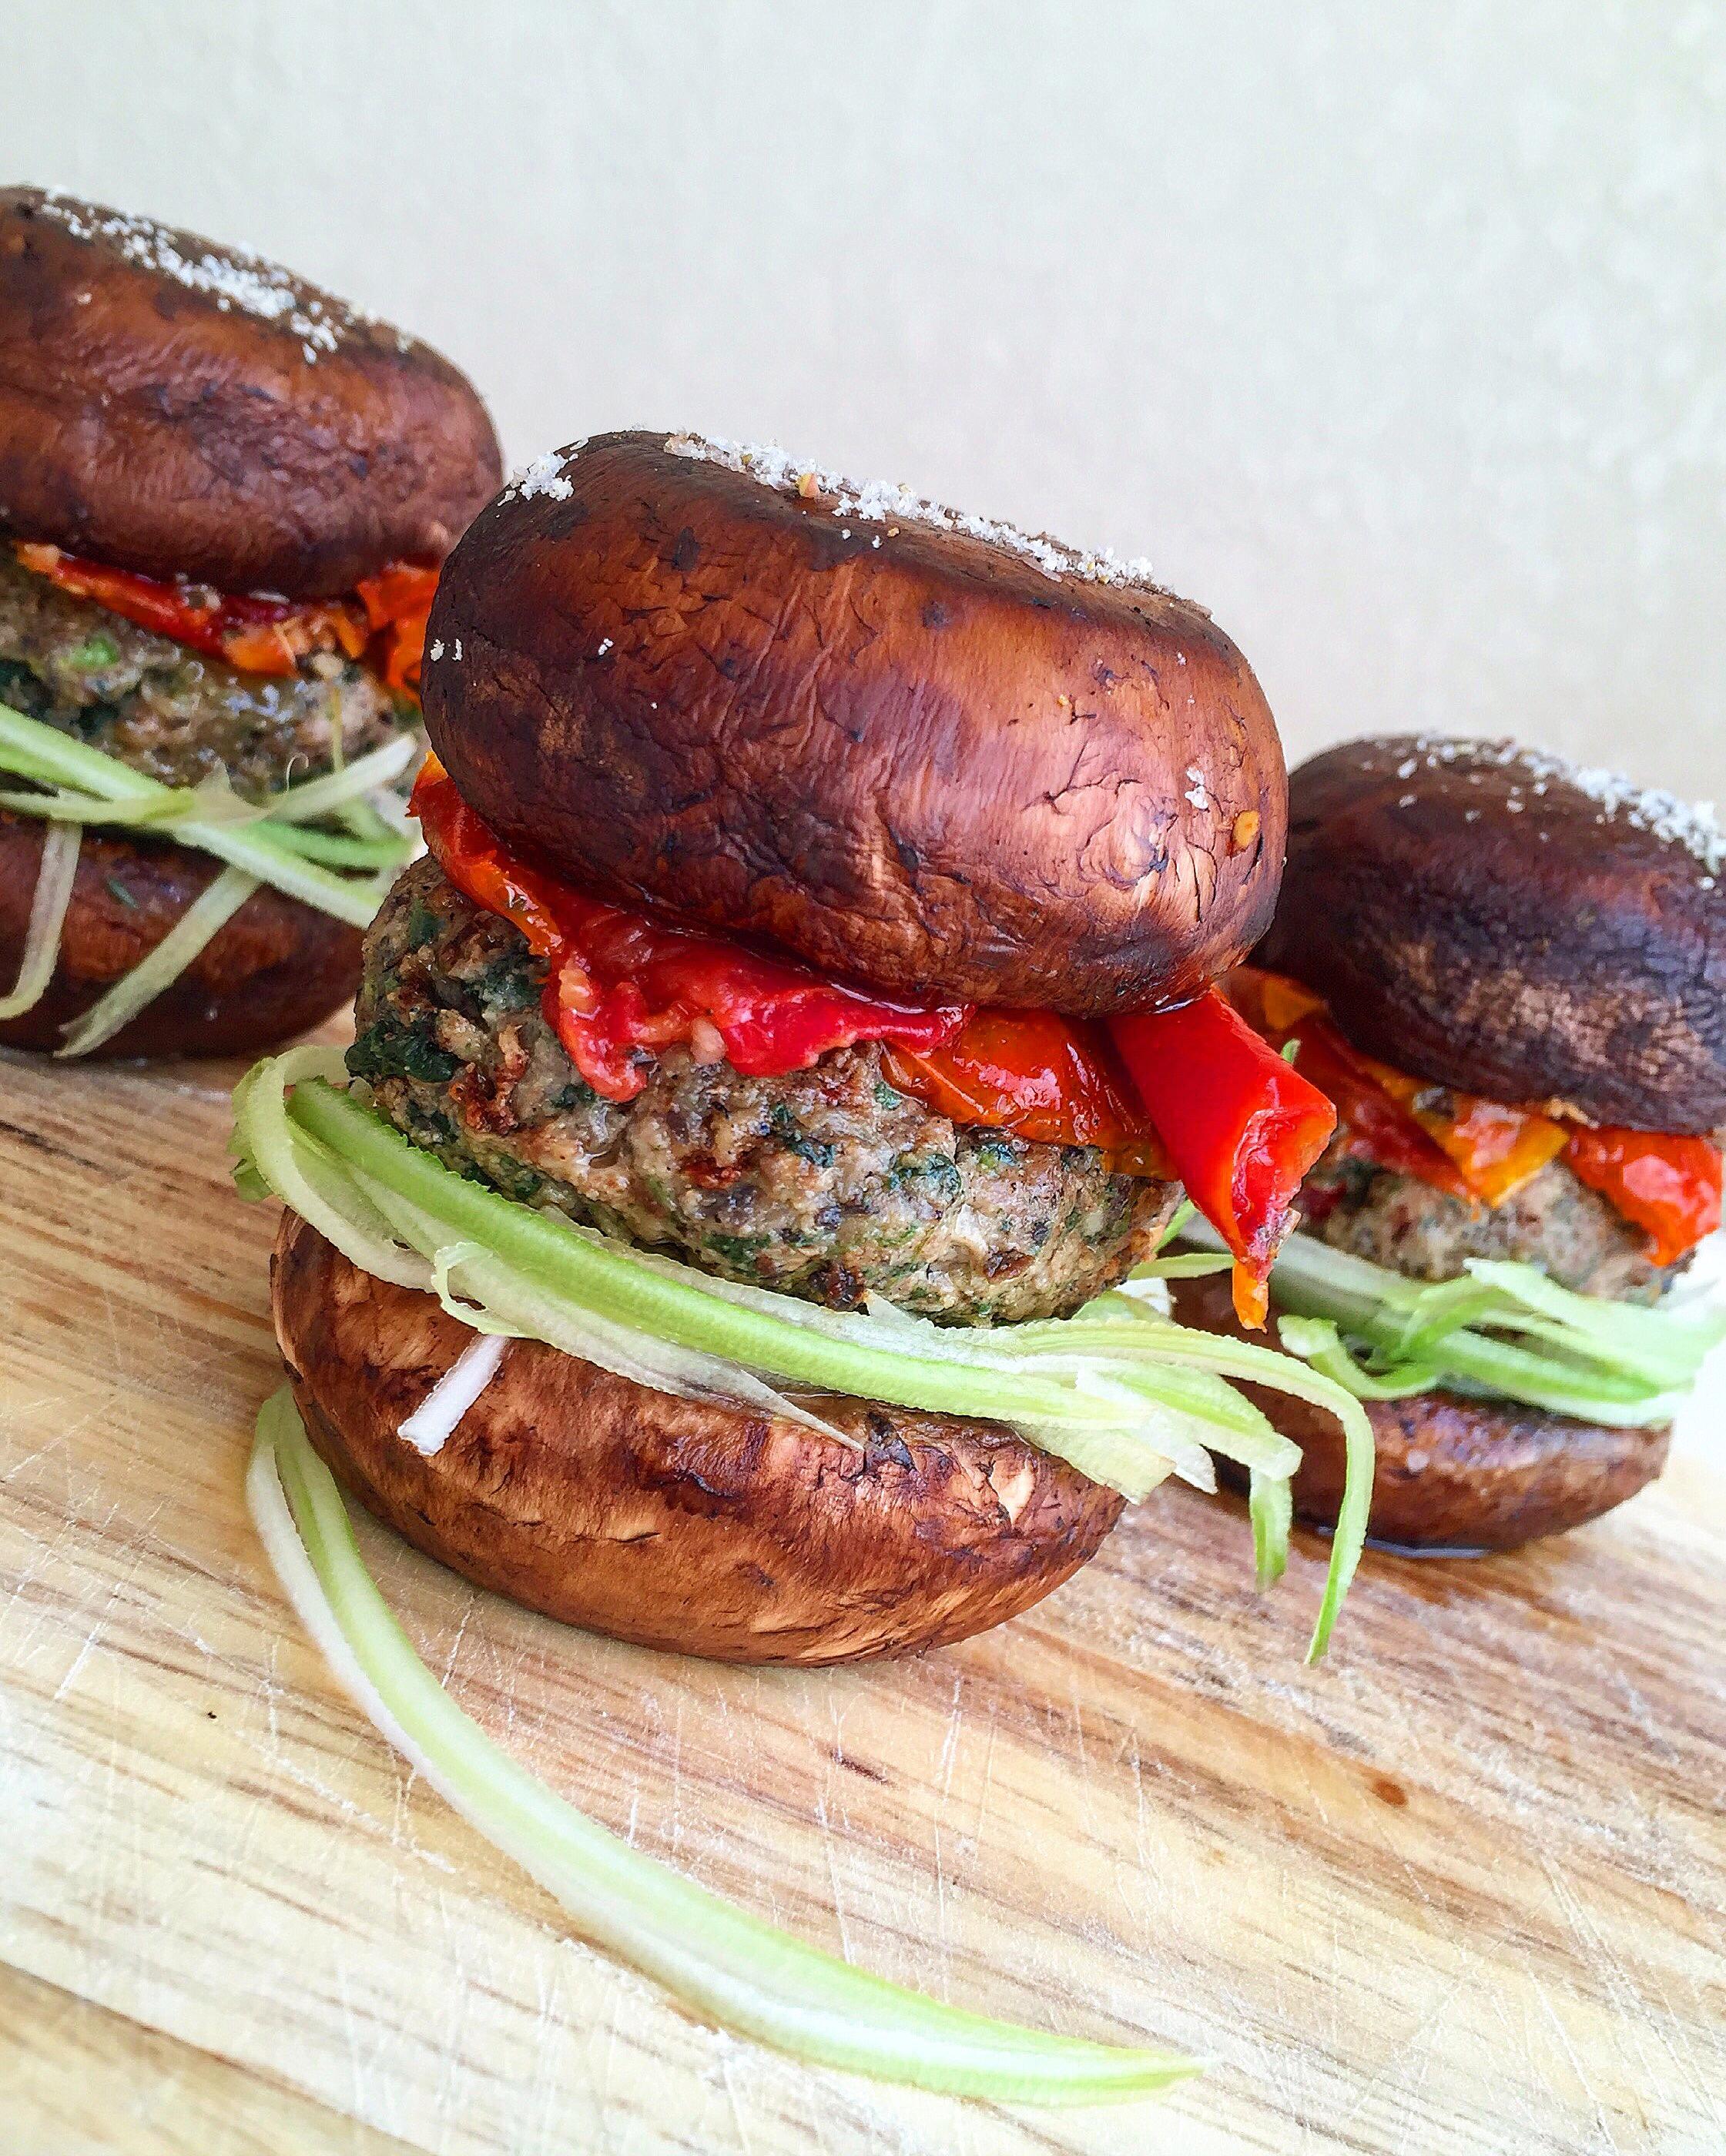 Green Pork Sliders - made with spinach, celery, mushrooms and onion for a veggie-heavy twist on savory pork sliders! | GrokGrub.com